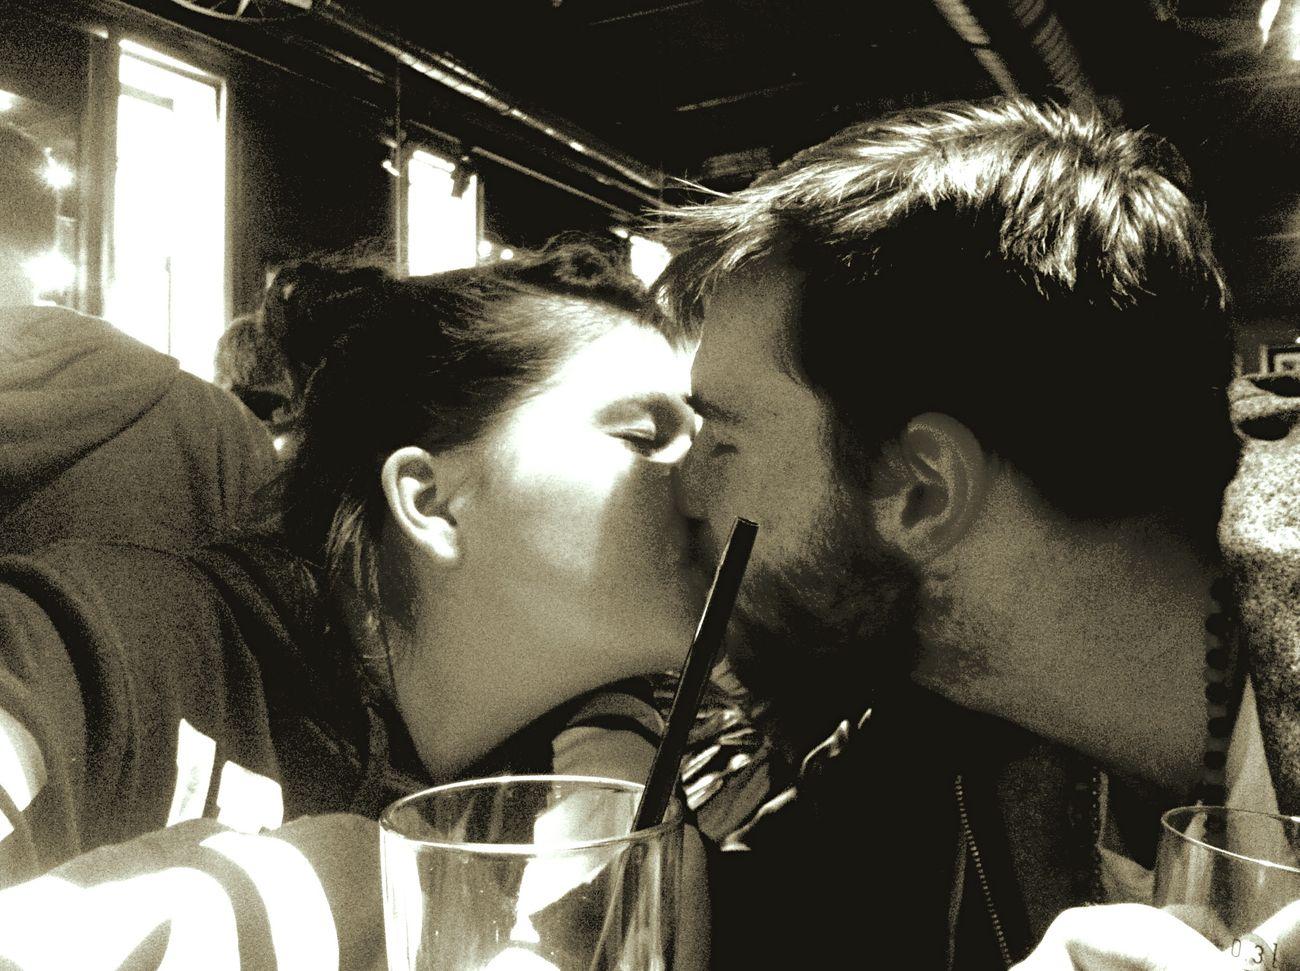 I Love You Love My Boy Love♡ Love My Boy Hardrock Café Köln